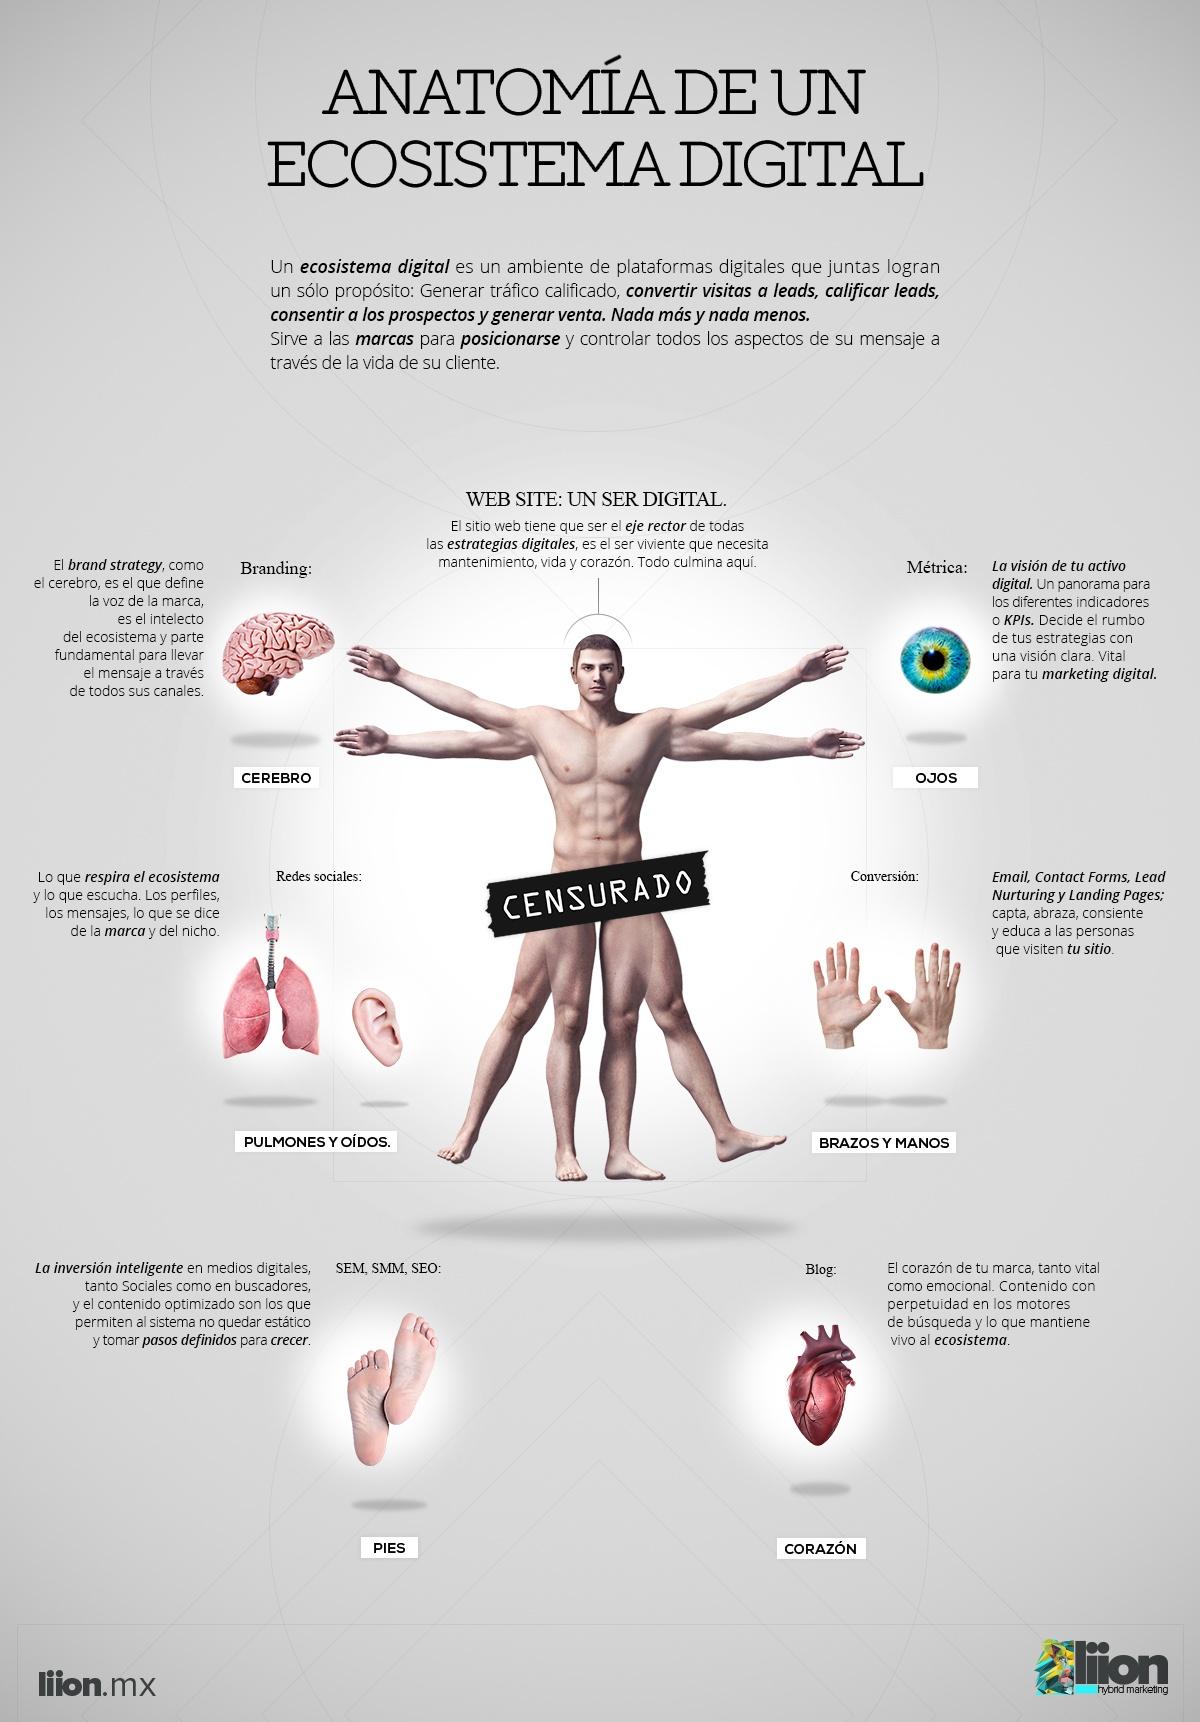 info_anatoma_3.jpg